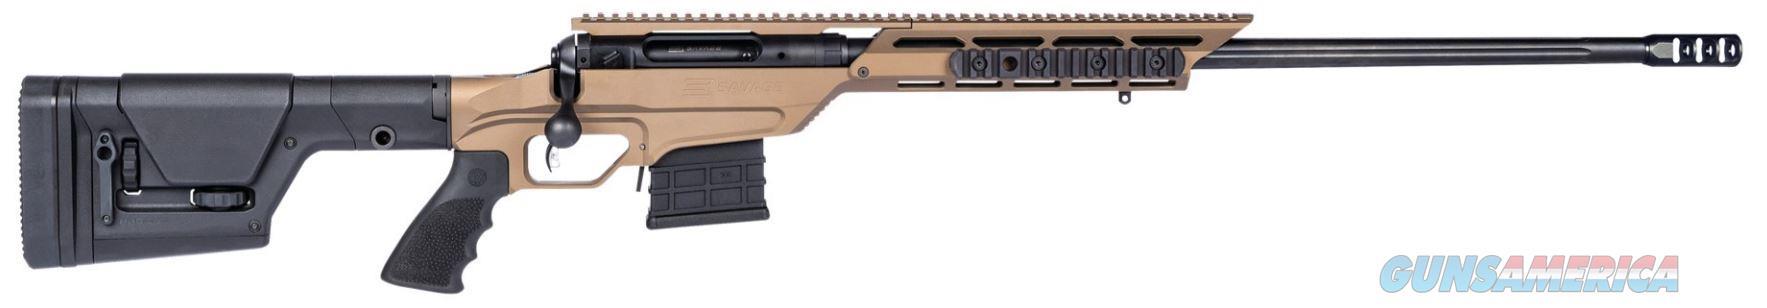 Savage Arms 10 STEALTH EVO 308WIN 20 TB 22860|SHORT ACTION|THREAD BBL  Guns > Rifles > Savage Rifles > Standard Bolt Action > Tactical